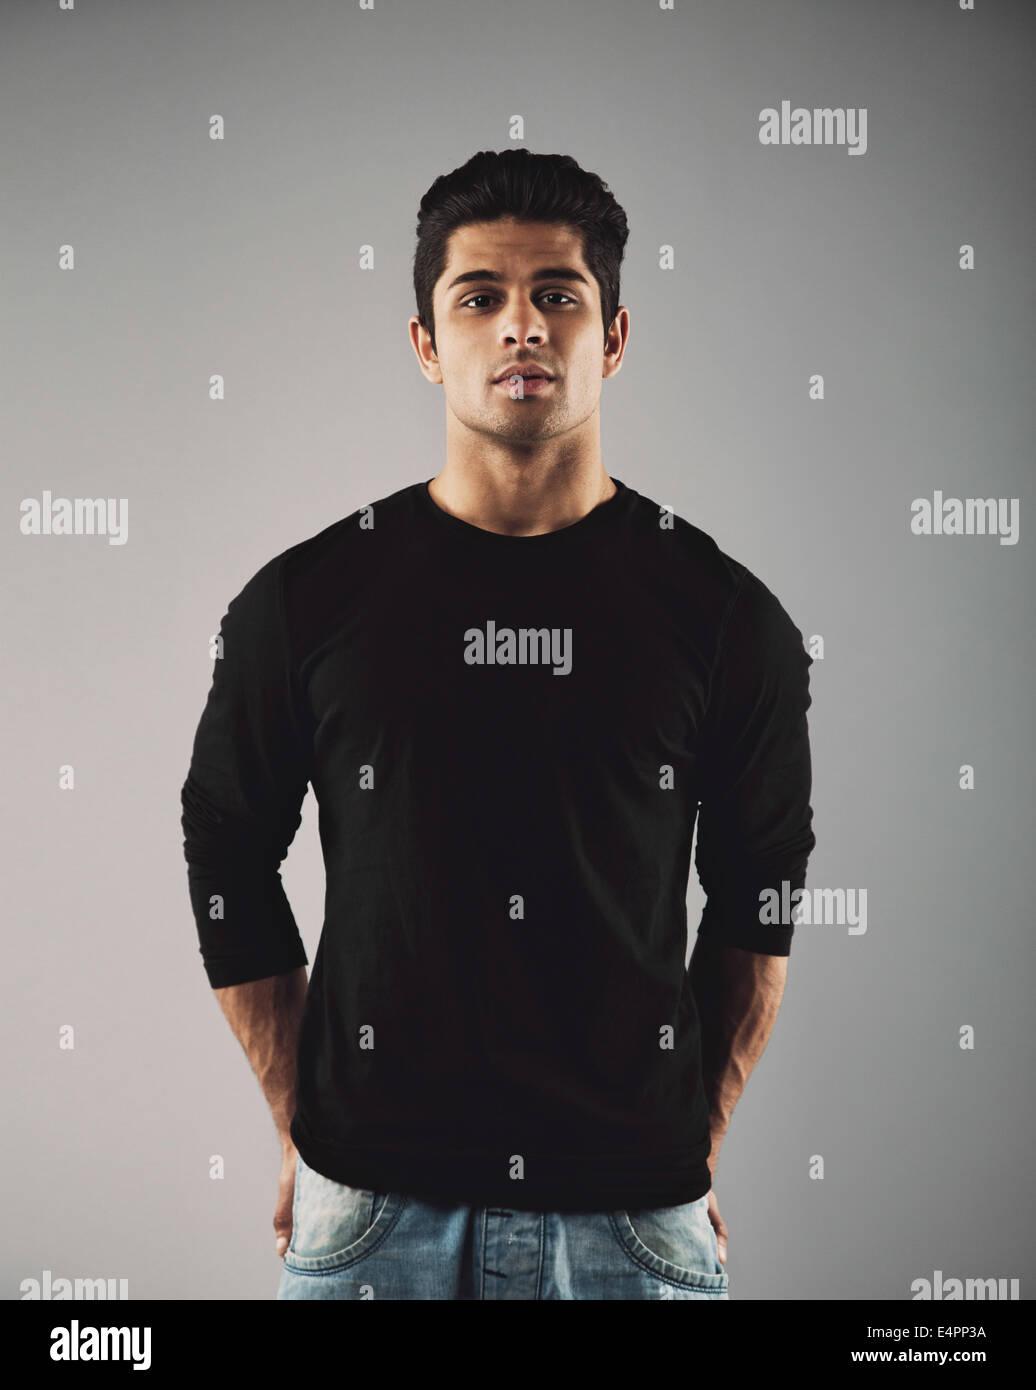 Retrato de joven apuesto chico hispano posando. Smart modelo moda masculina posando sobre fondo gris. Imagen De Stock